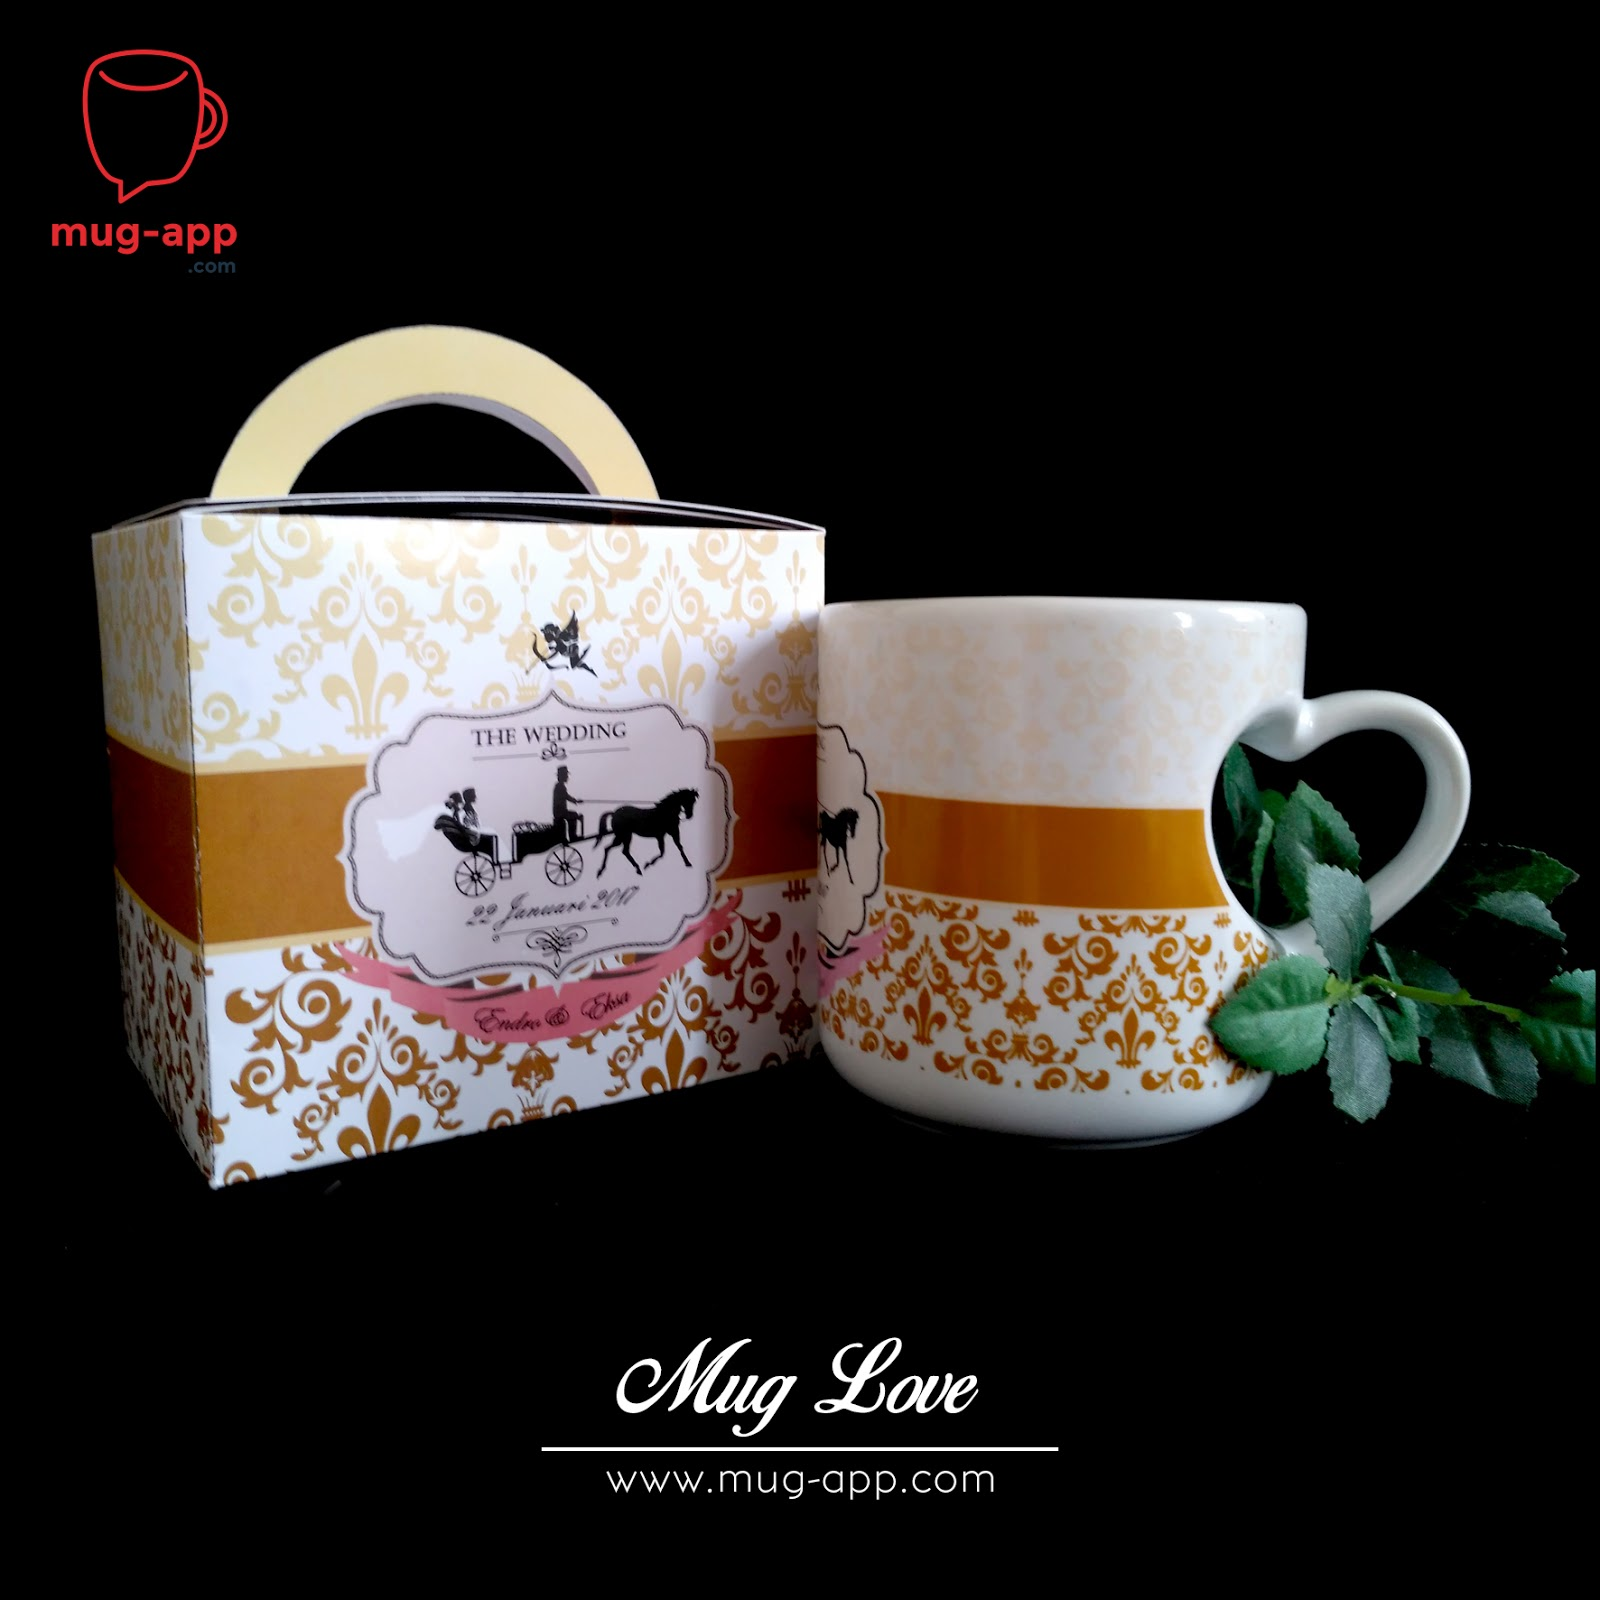 Souvenir Pernikahan Elegan Keramik Mug Printing Trend Souvenir Pernikahan Mug Yang Populer